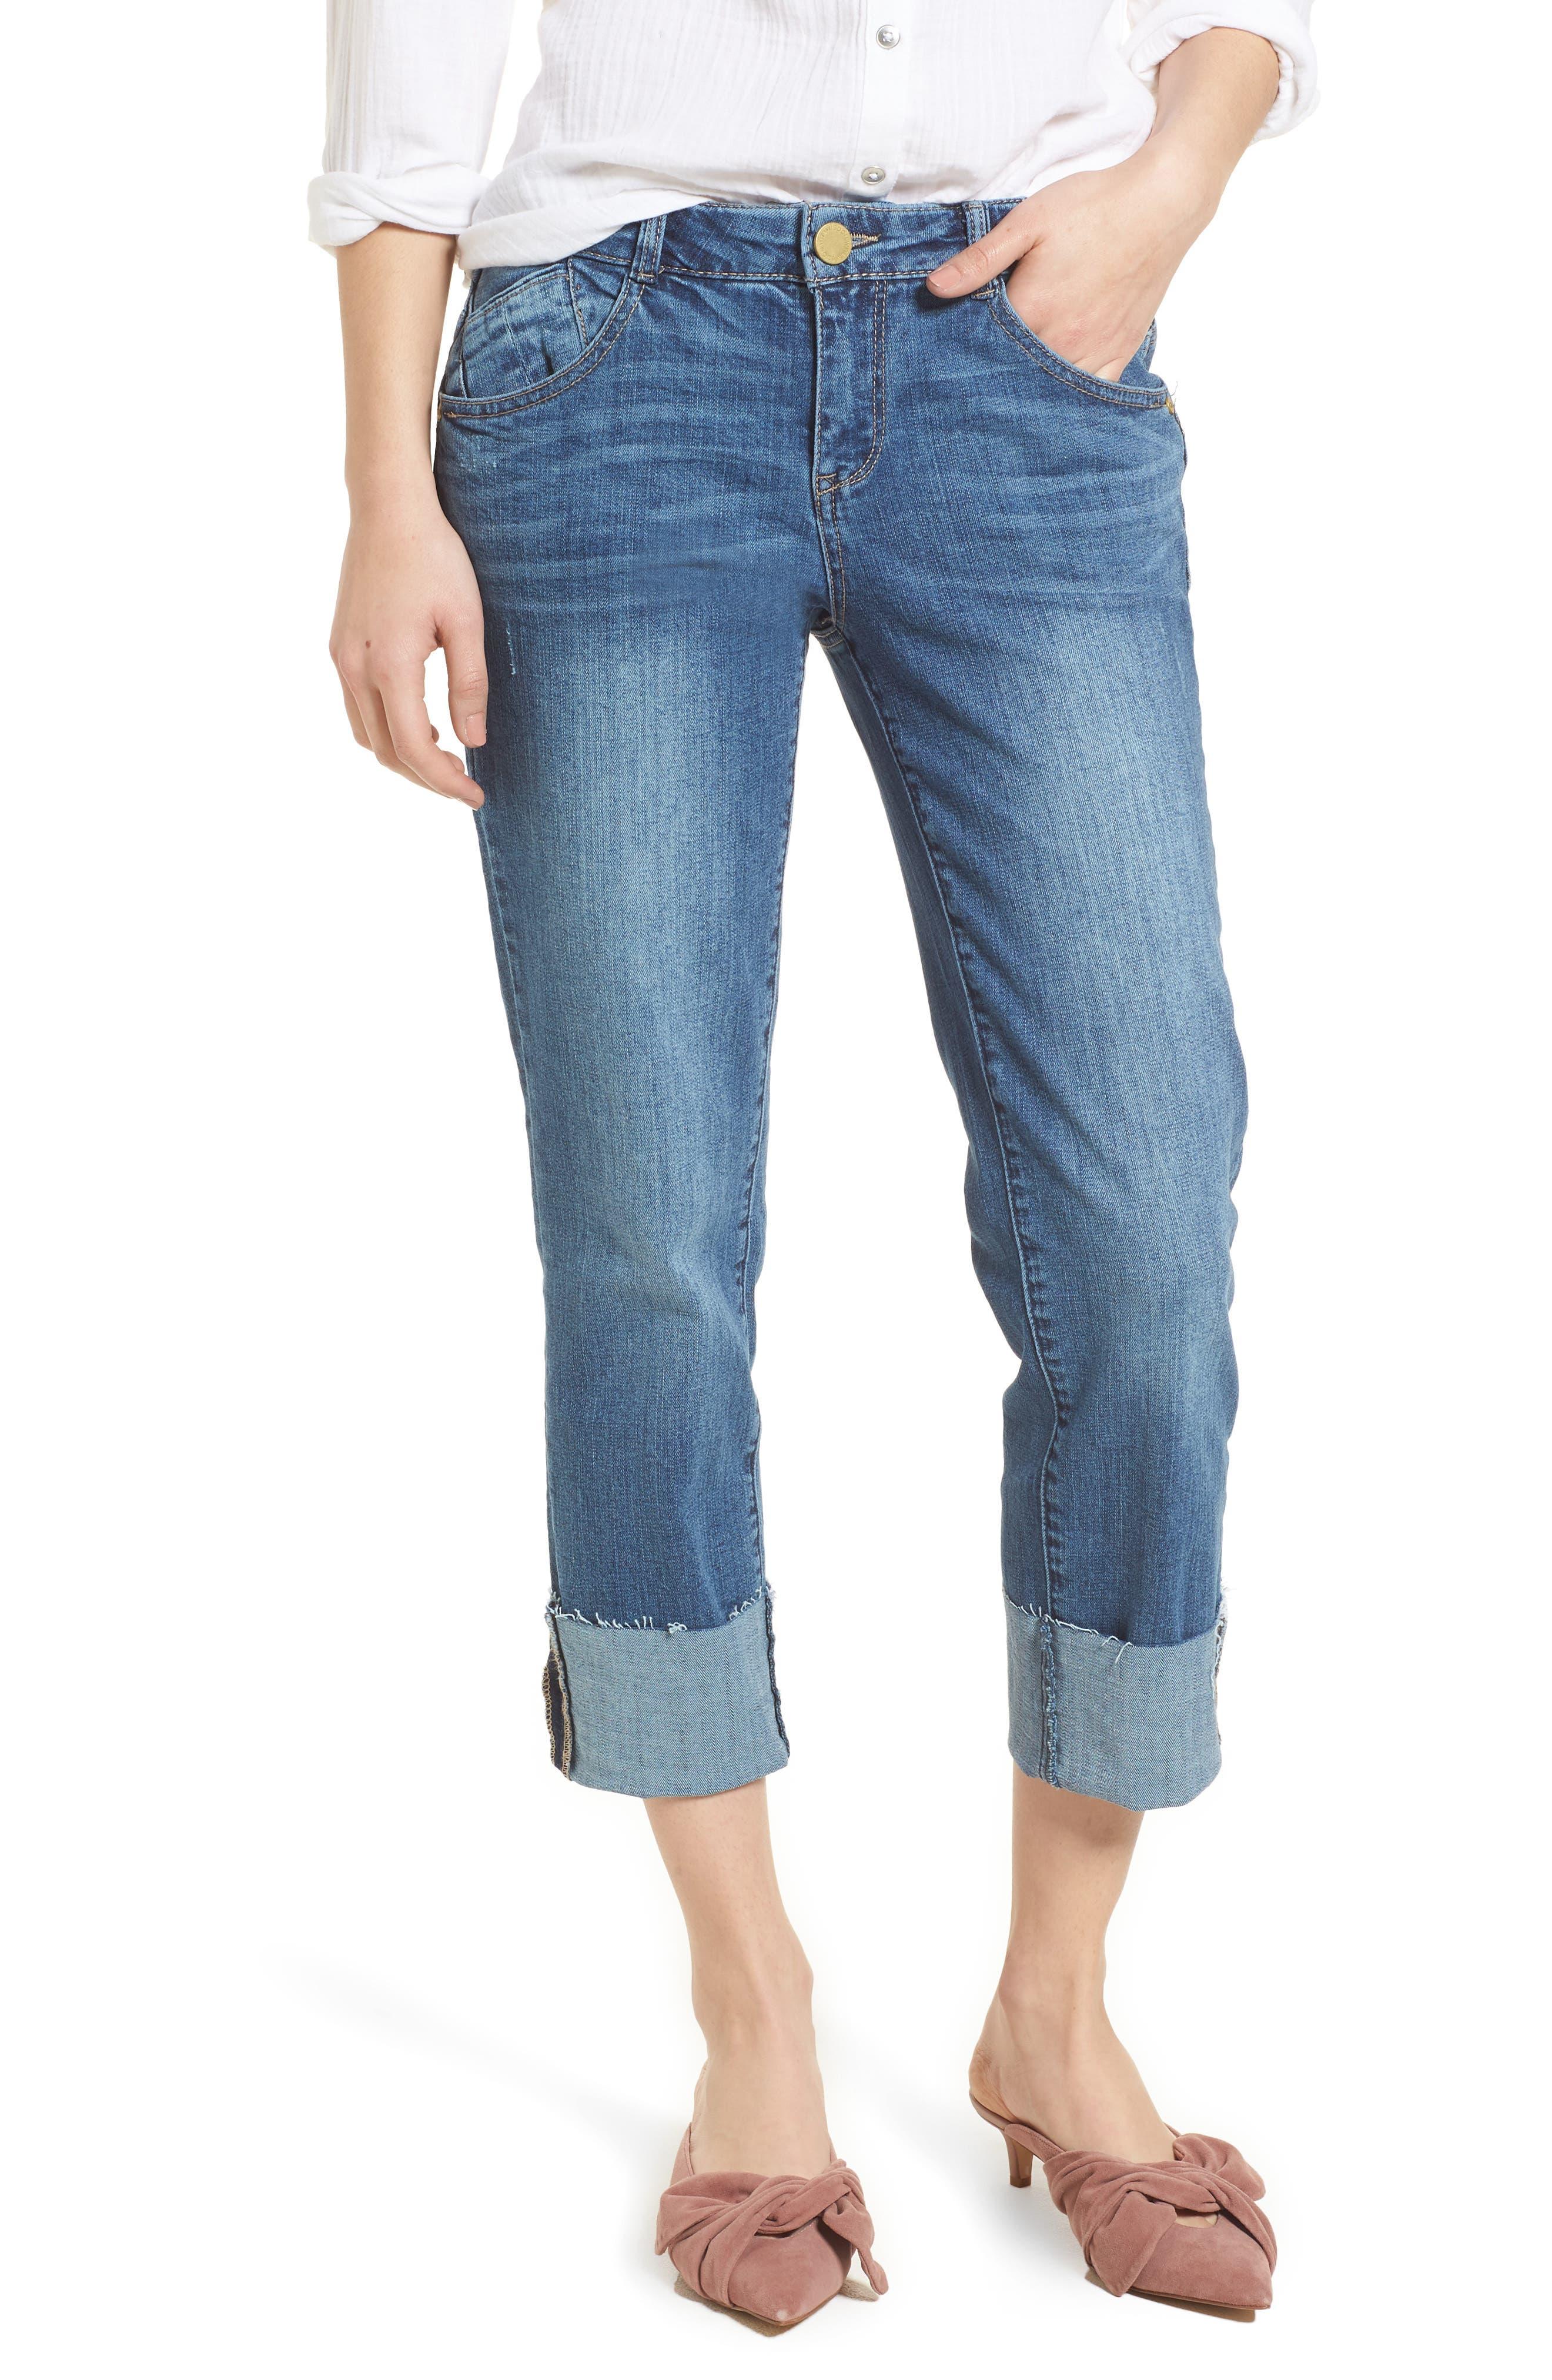 WIT & WISDOM Flex-ellent Cuffed Boyfriend Jeans, Main, color, BLUE